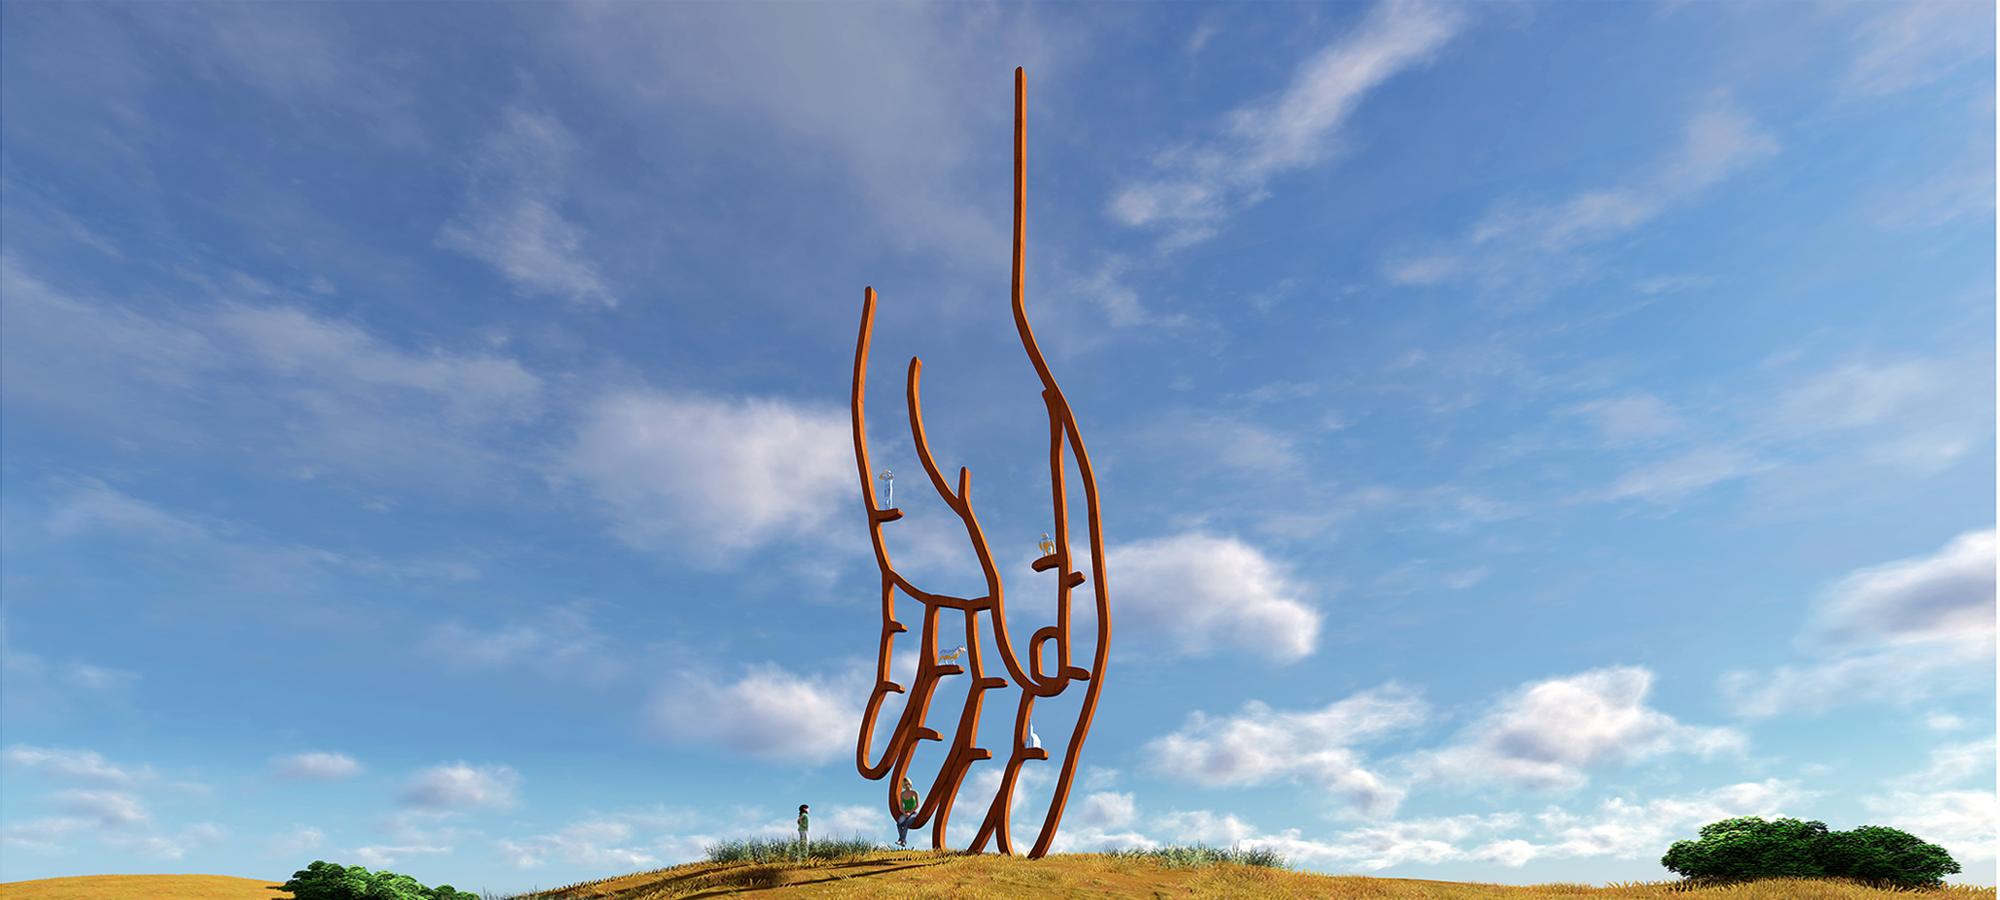 Public Art Texel, sculpture BlokLugthart